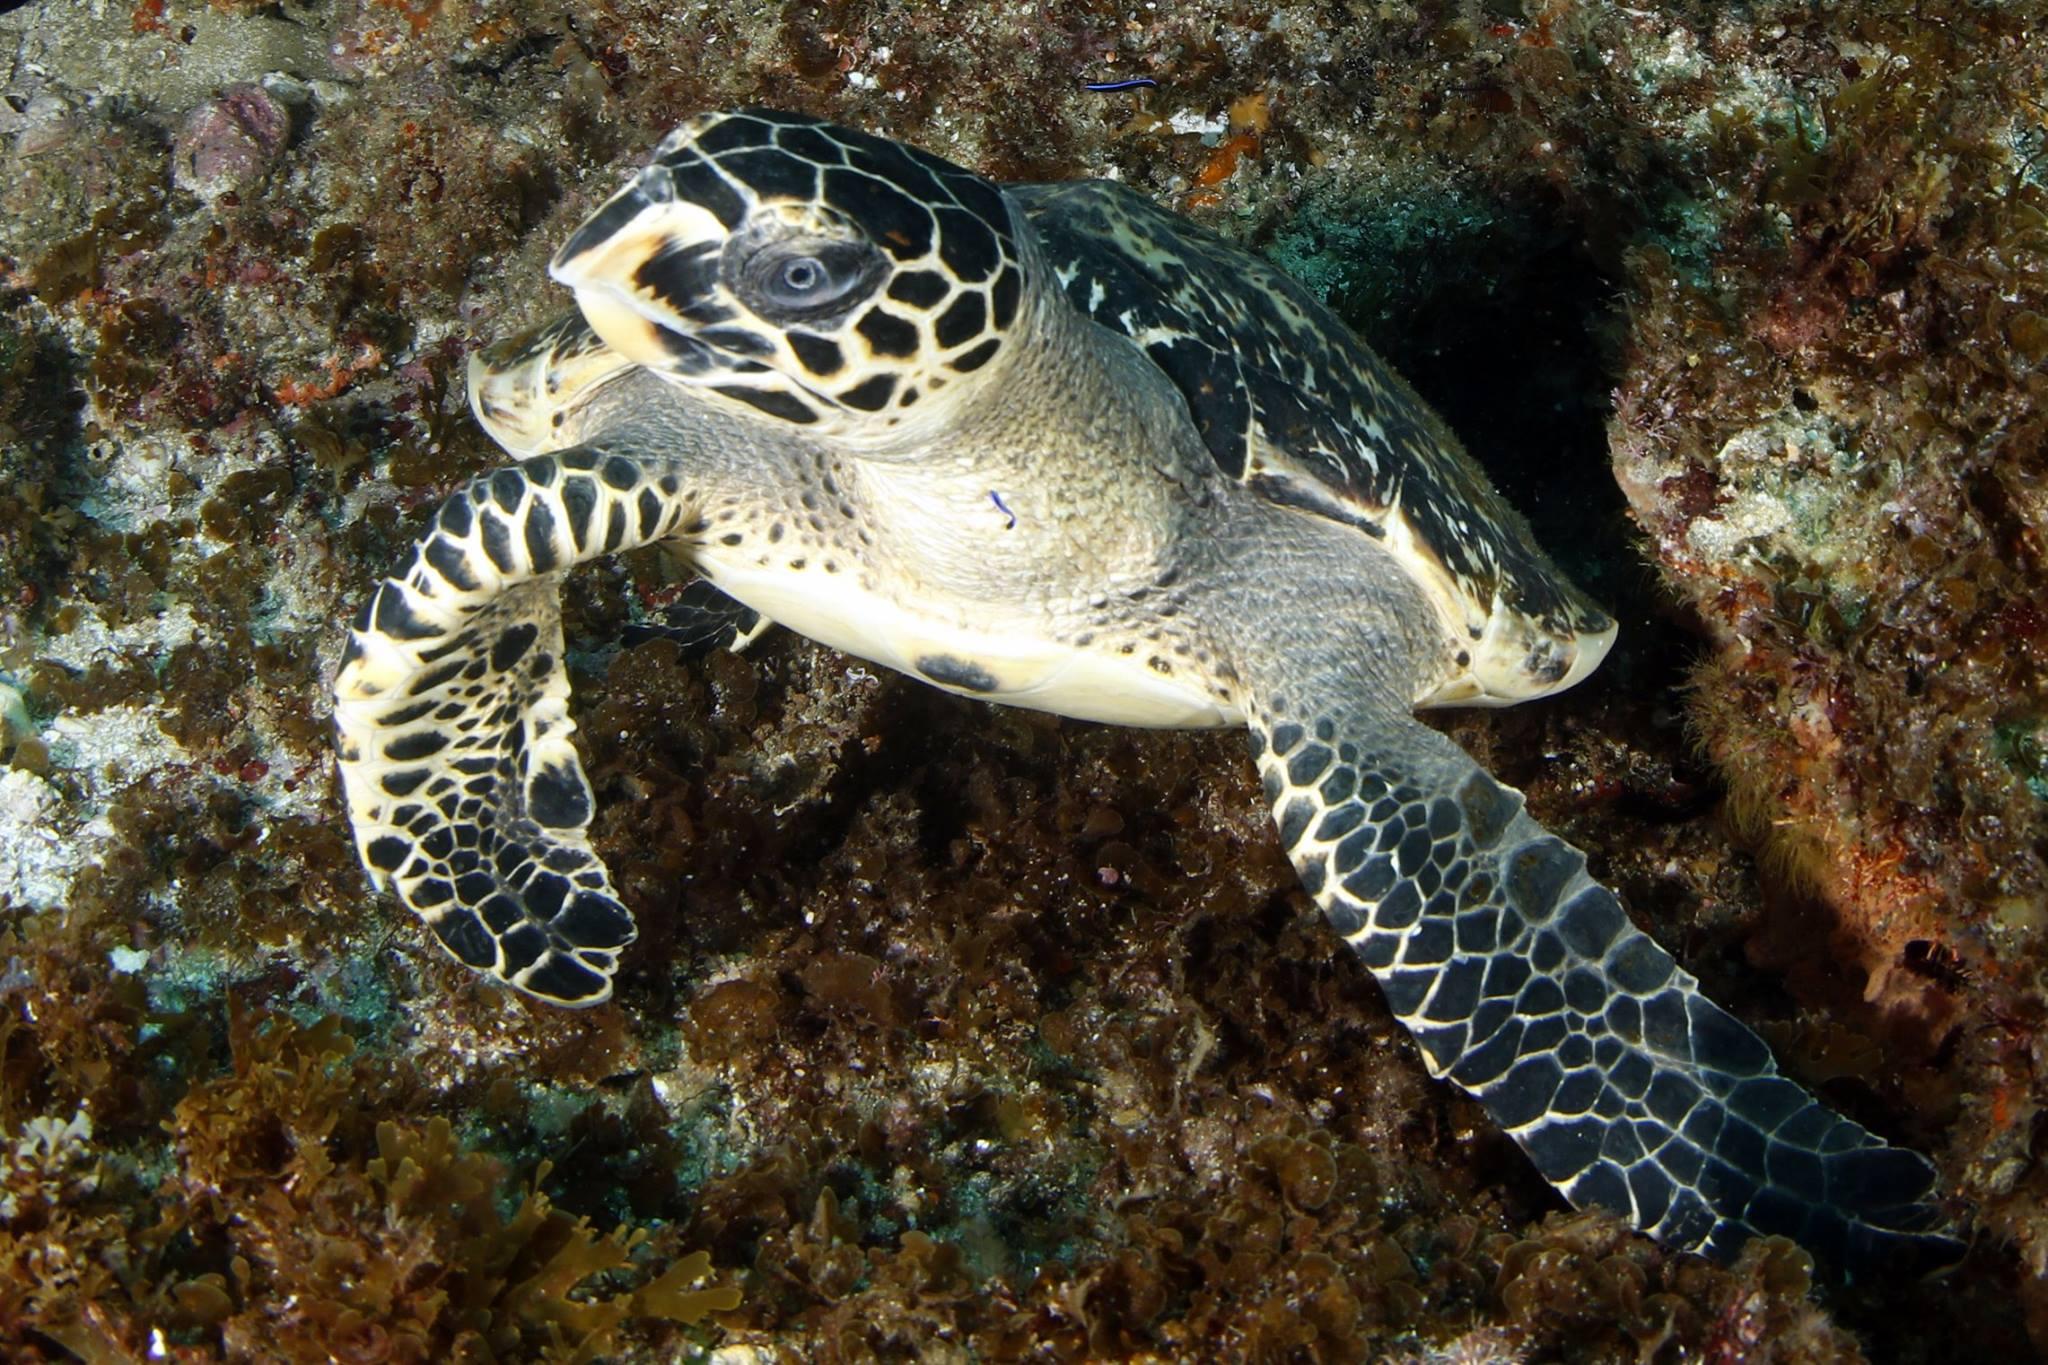 scuba diving aliwal shoal - south africa